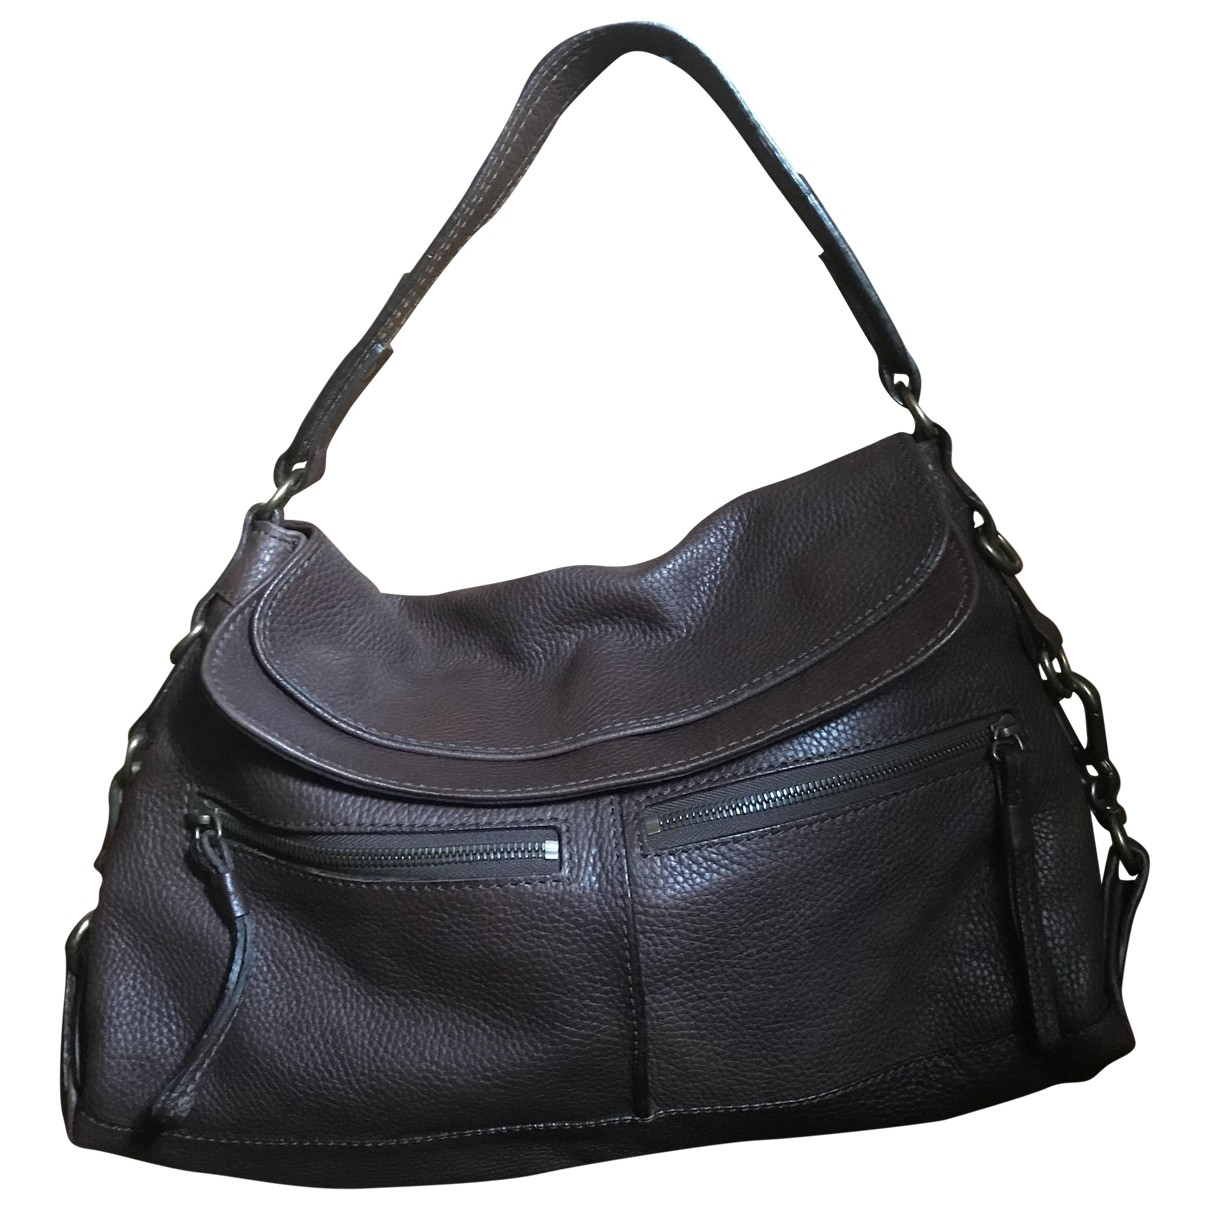 Andrea Mabiani \N Brown Leather handbag for Women \N